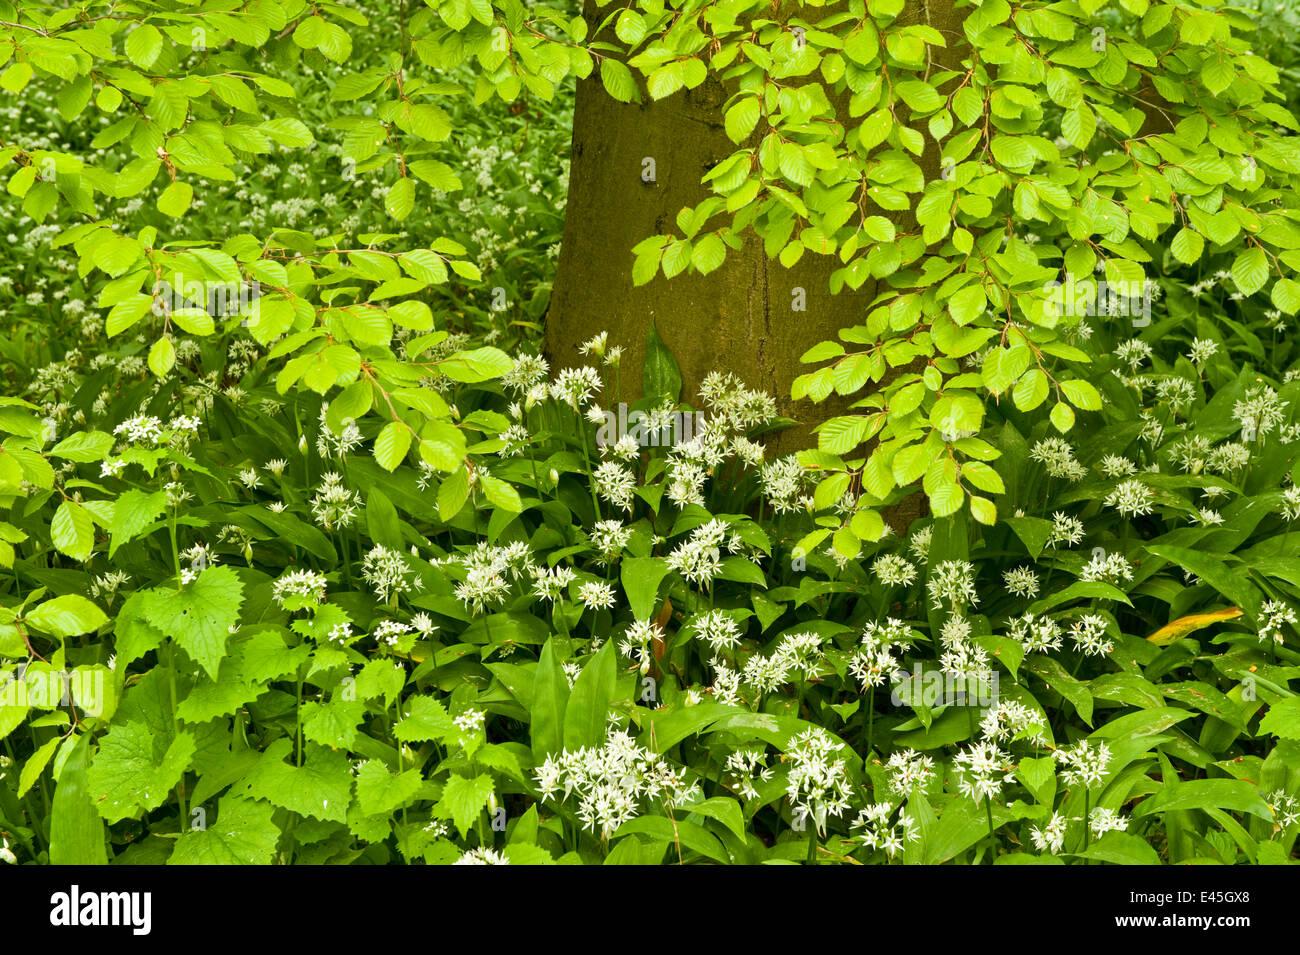 European beech tree (Fagus sylvatica) and undergrowth including Wild ...